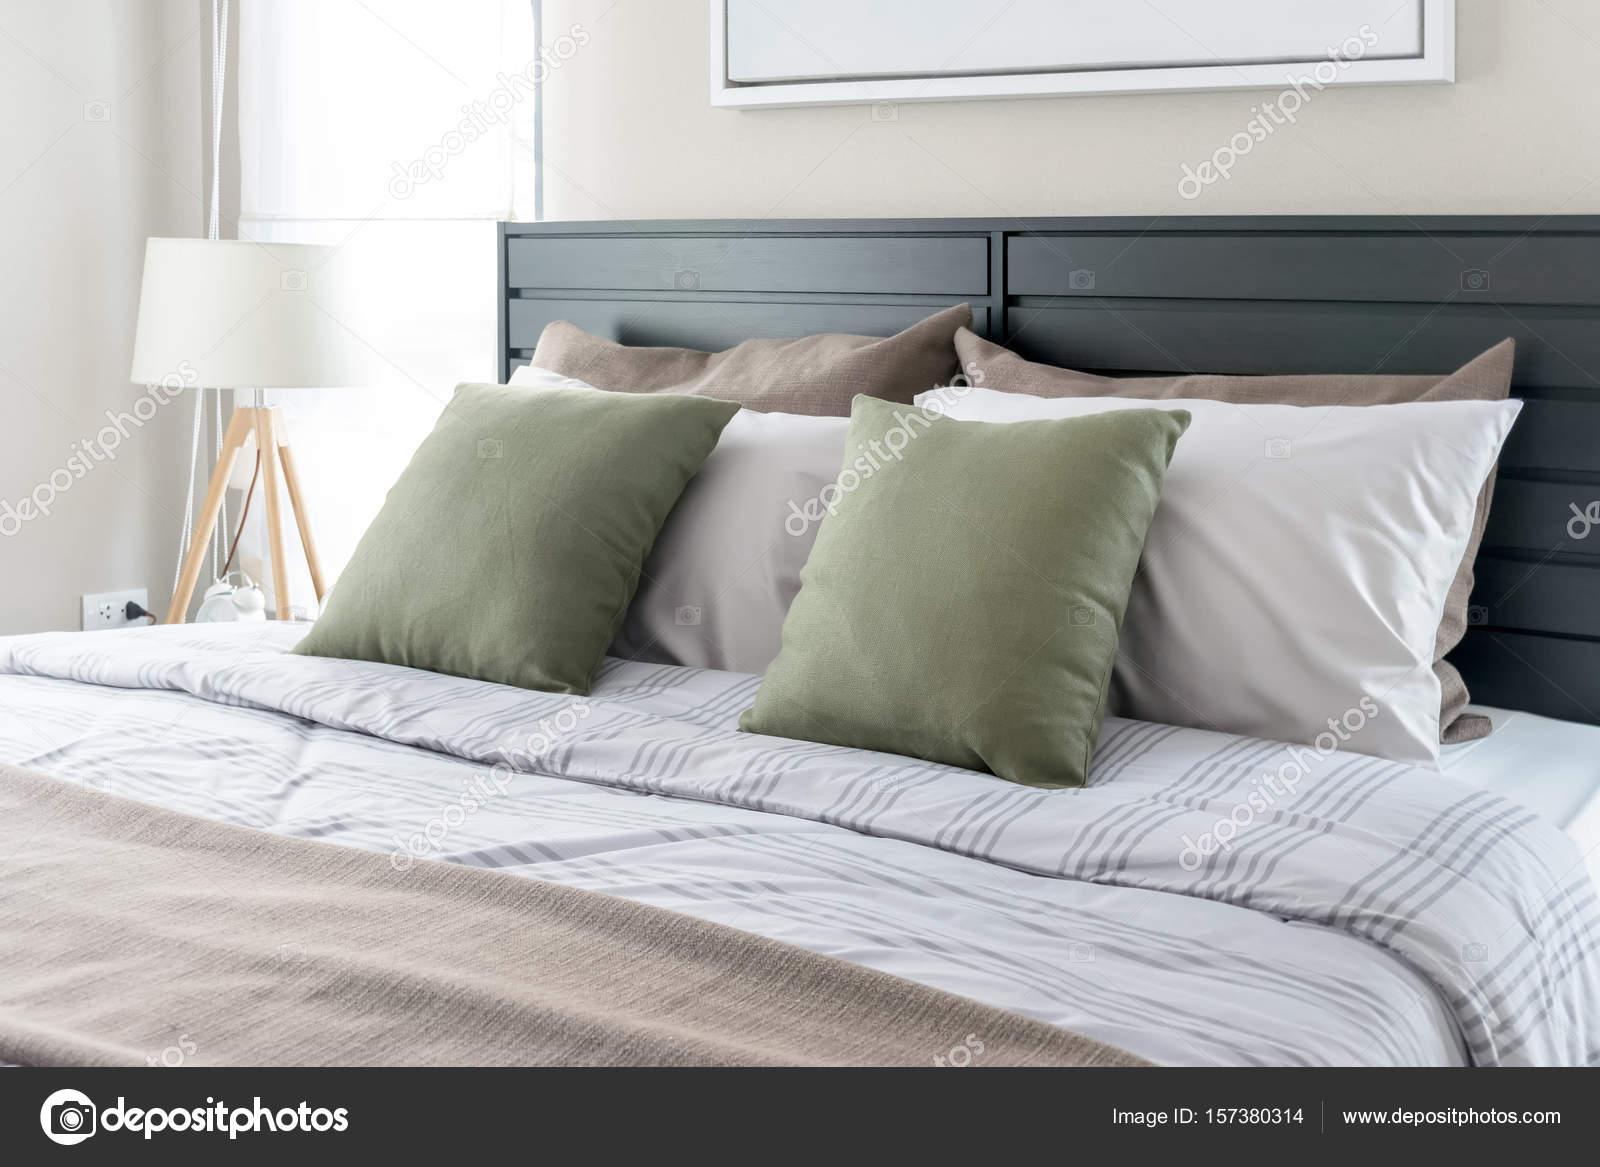 https://st3.depositphotos.com/6200870/15738/i/1600/depositphotos_157380314-stockafbeelding-moderne-slaapkamer-met-groene-kussens.jpg